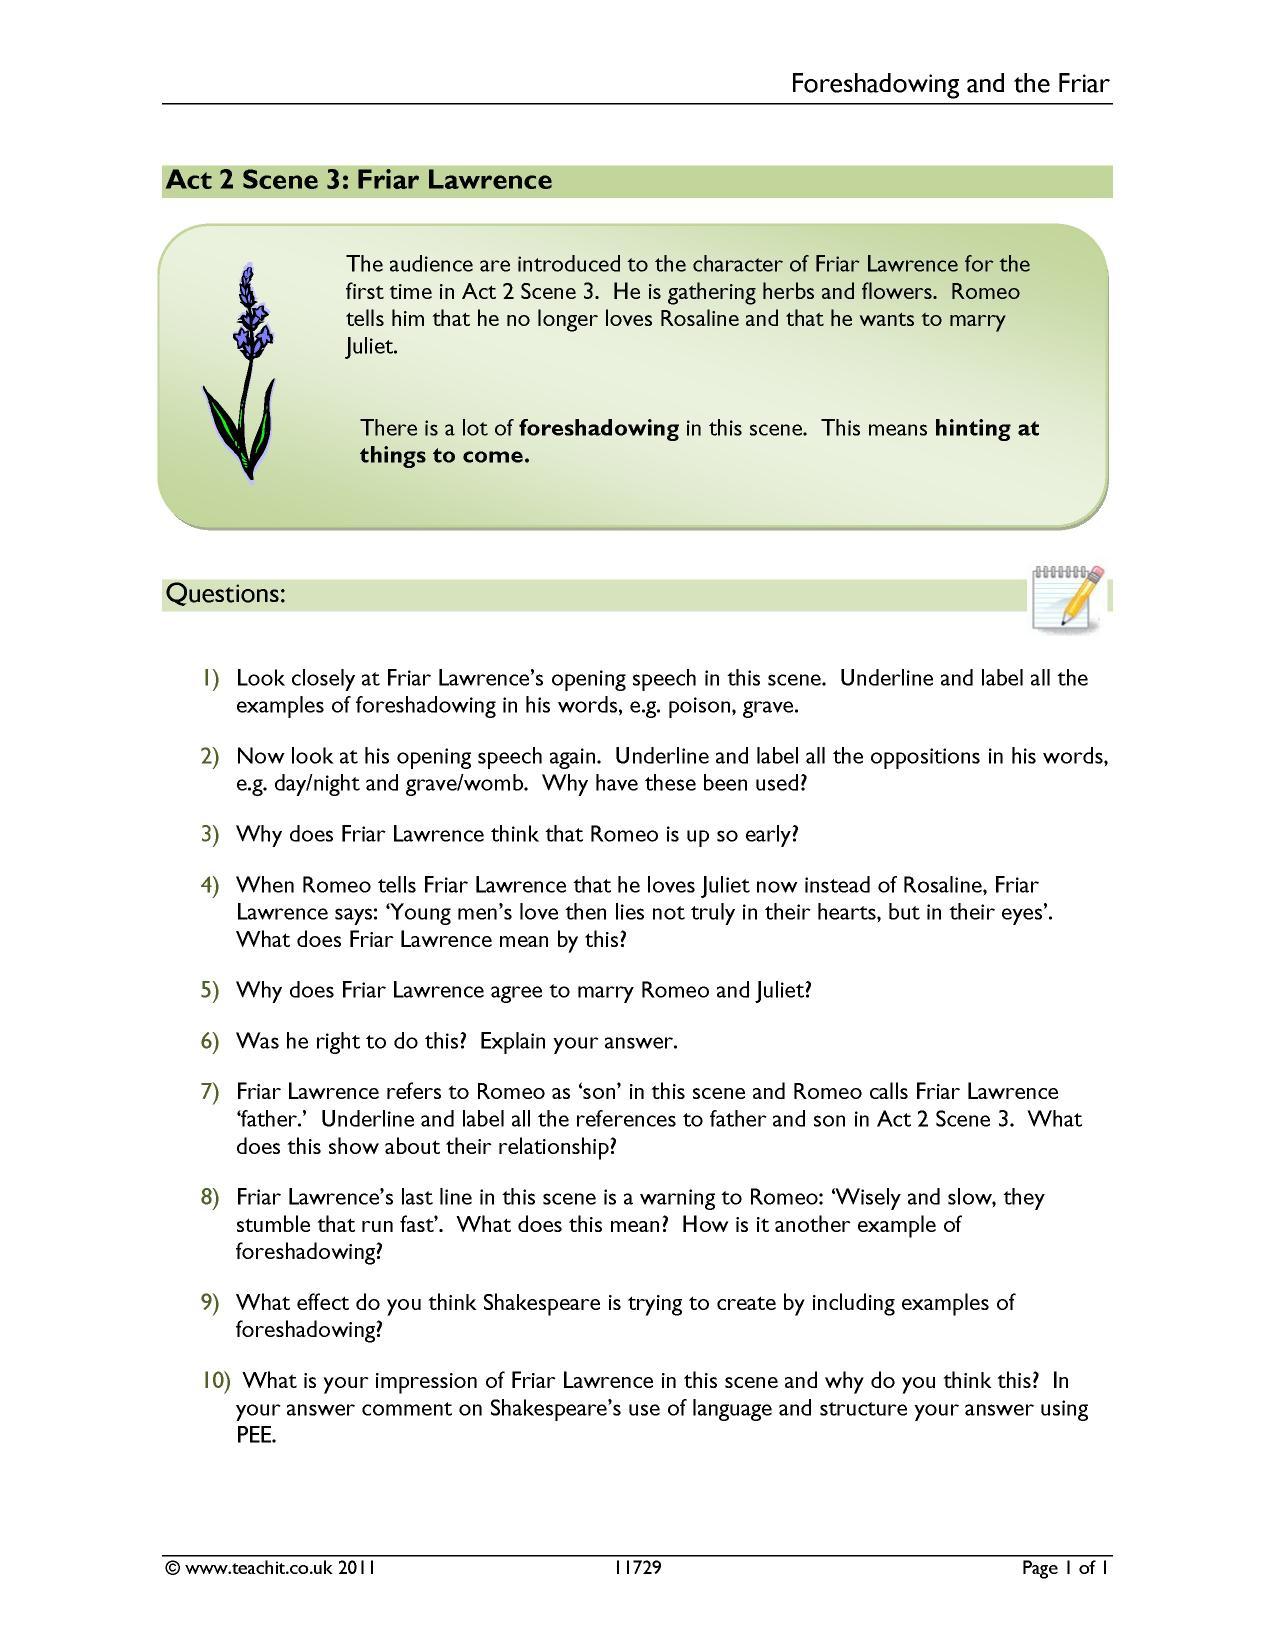 Counterpoint persuasive essay